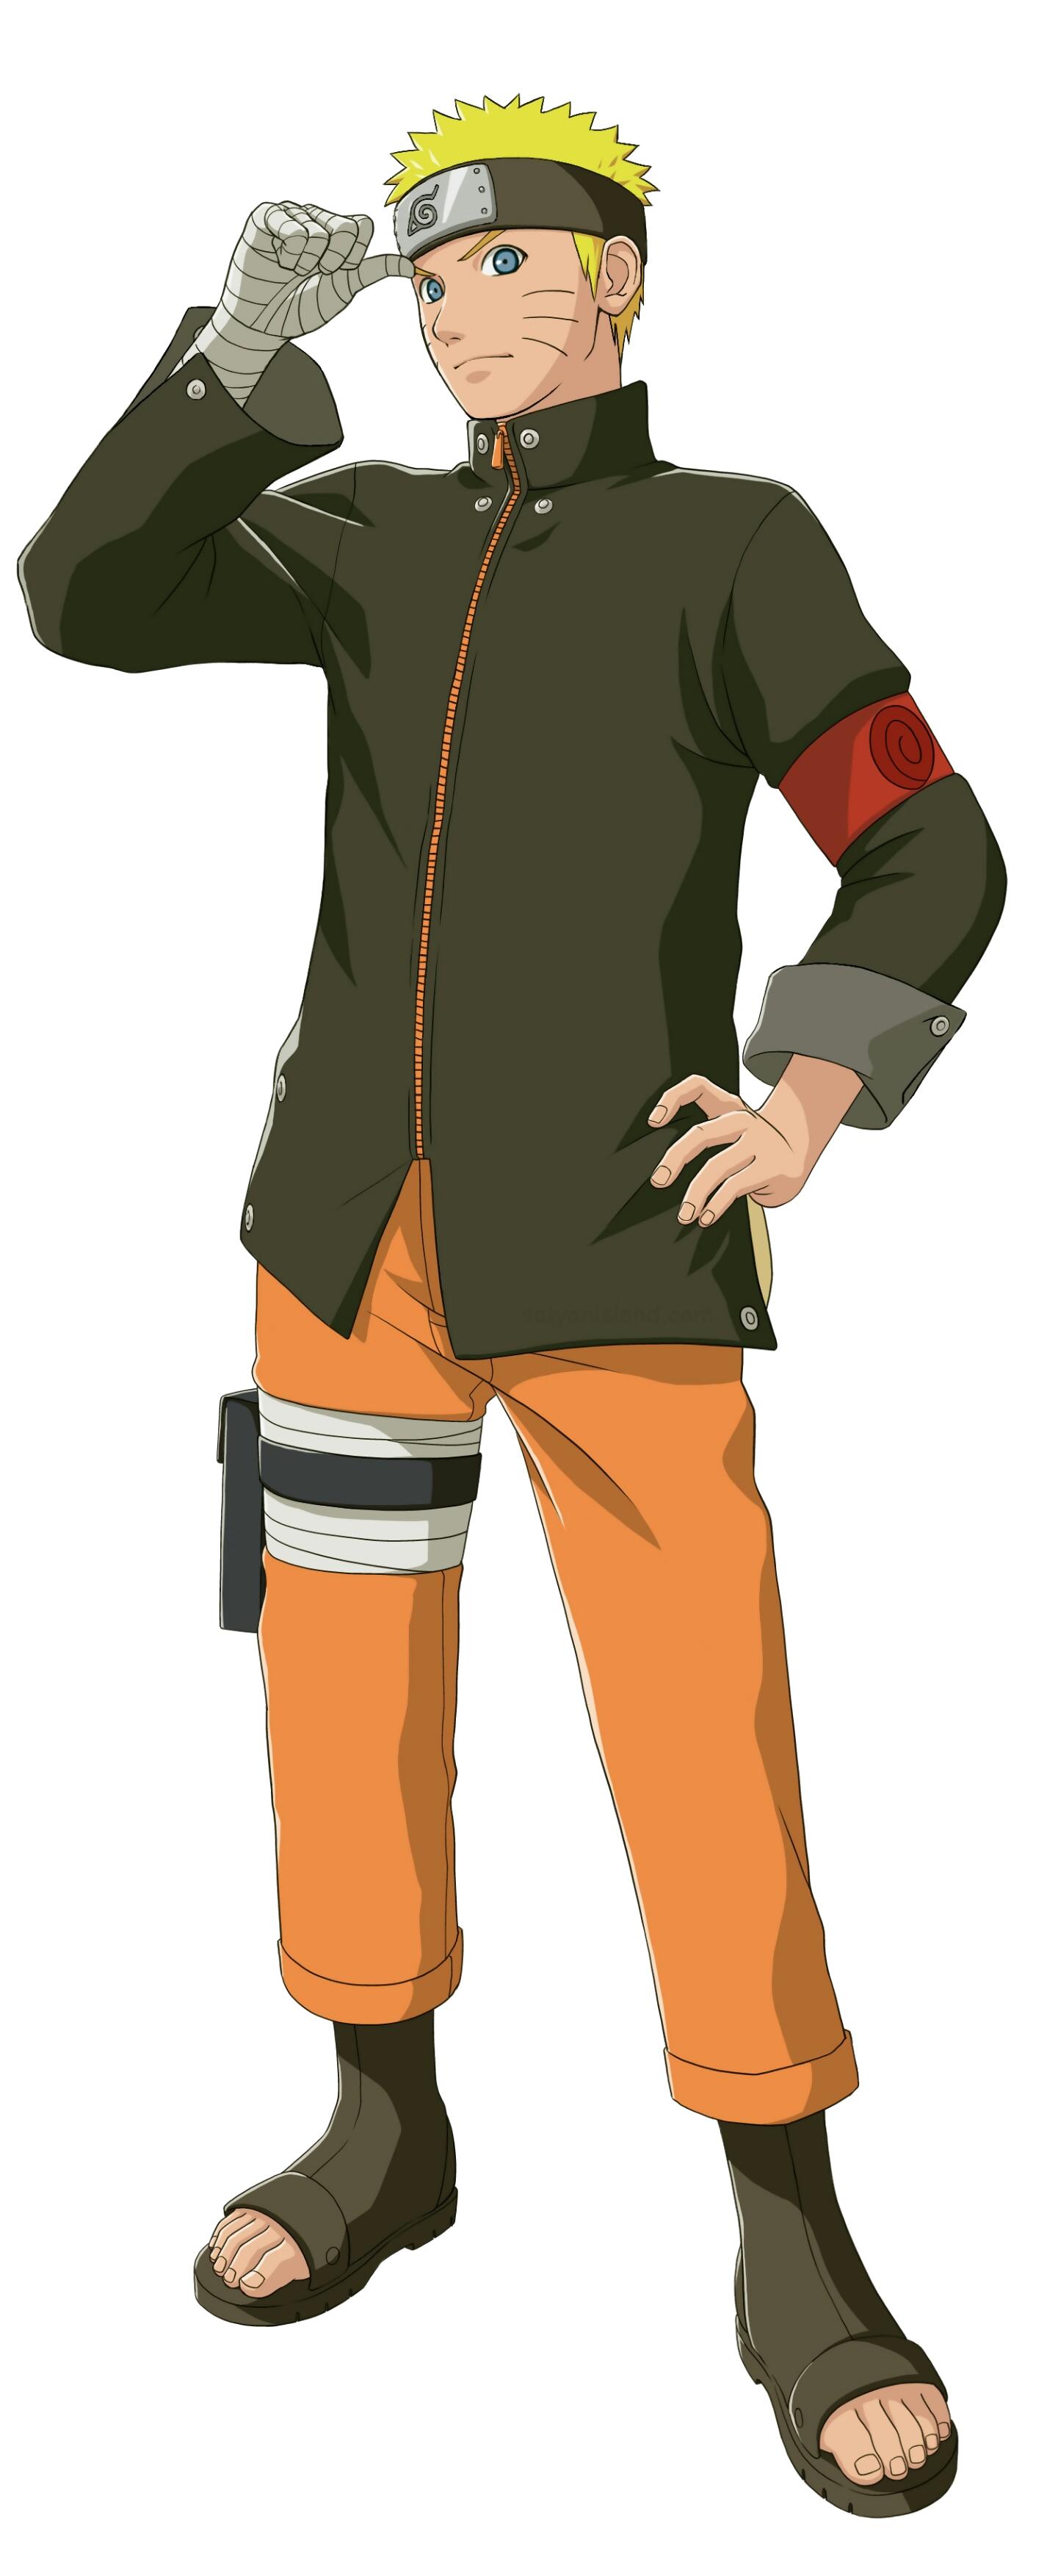 Naruto_-_The_Last.png